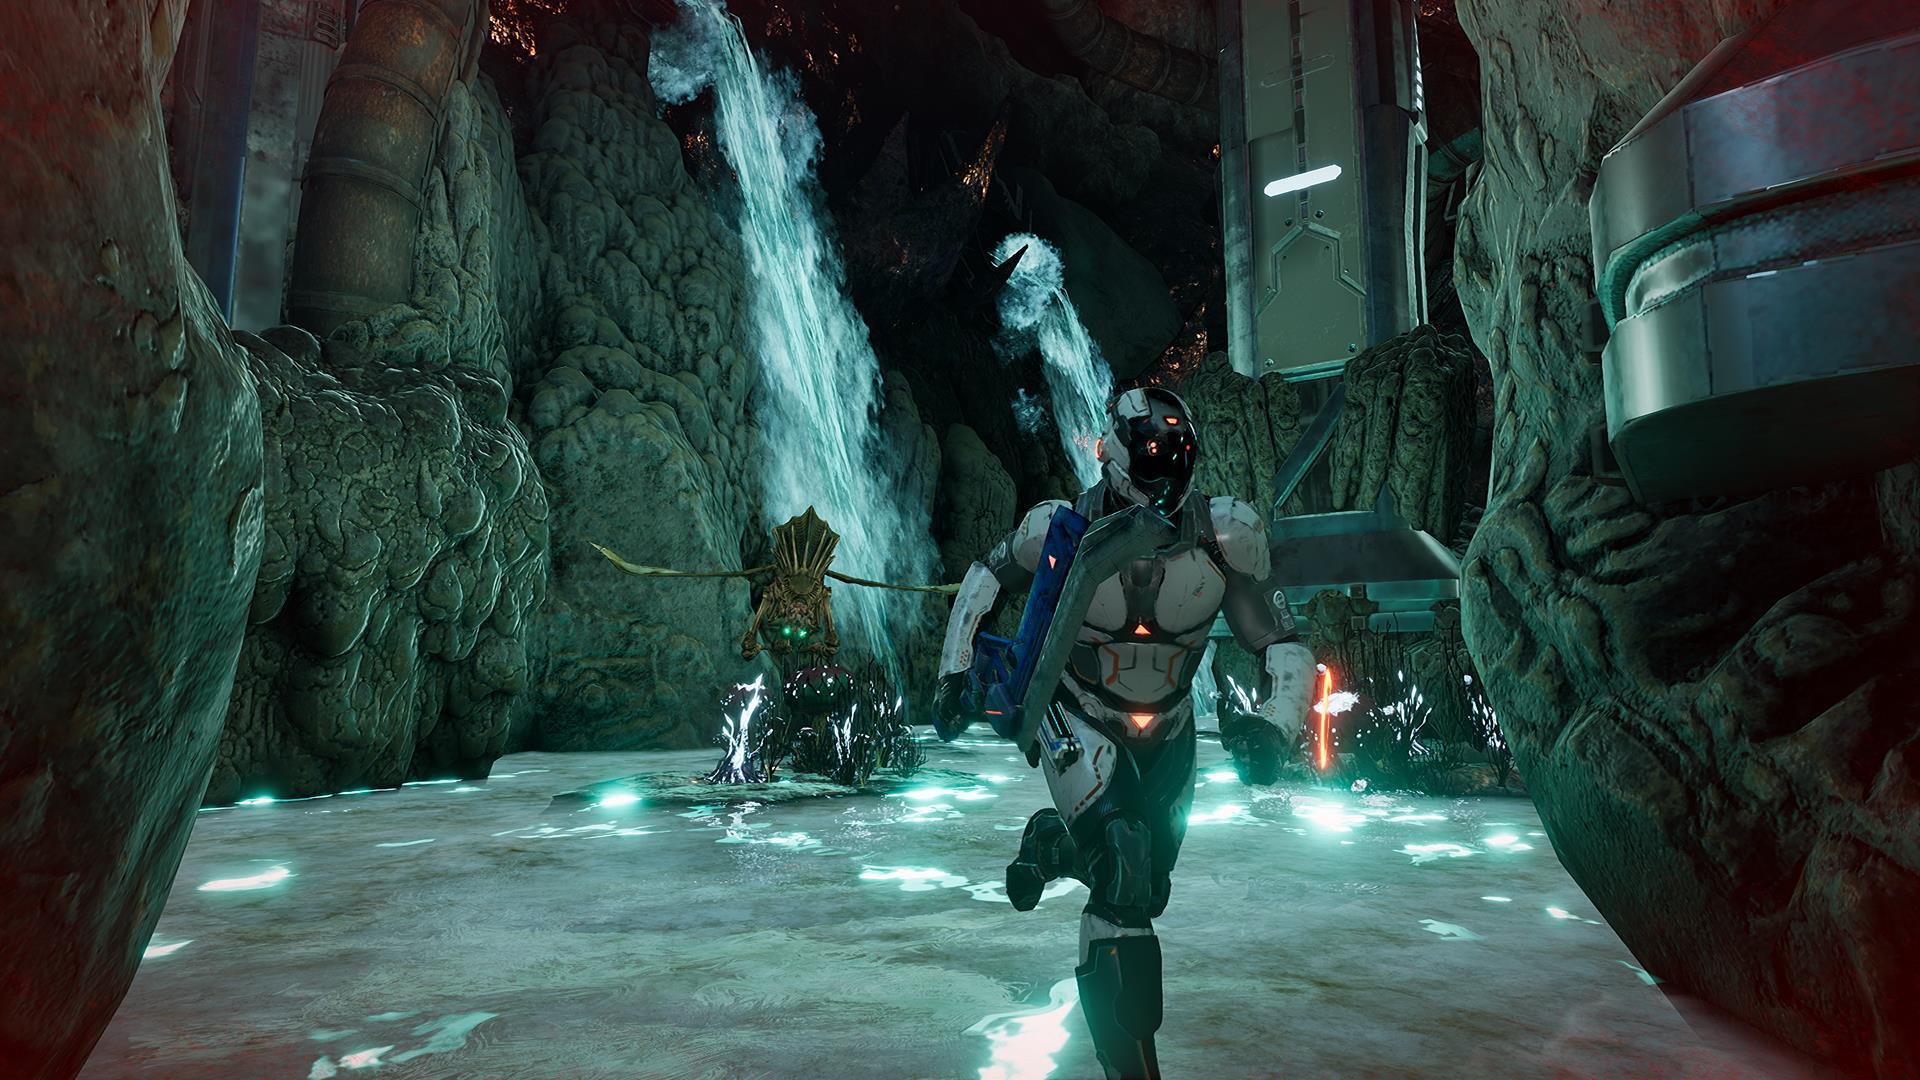 Dolmen is a Souls-like action RPG set in a cosmic horror sci-fi world